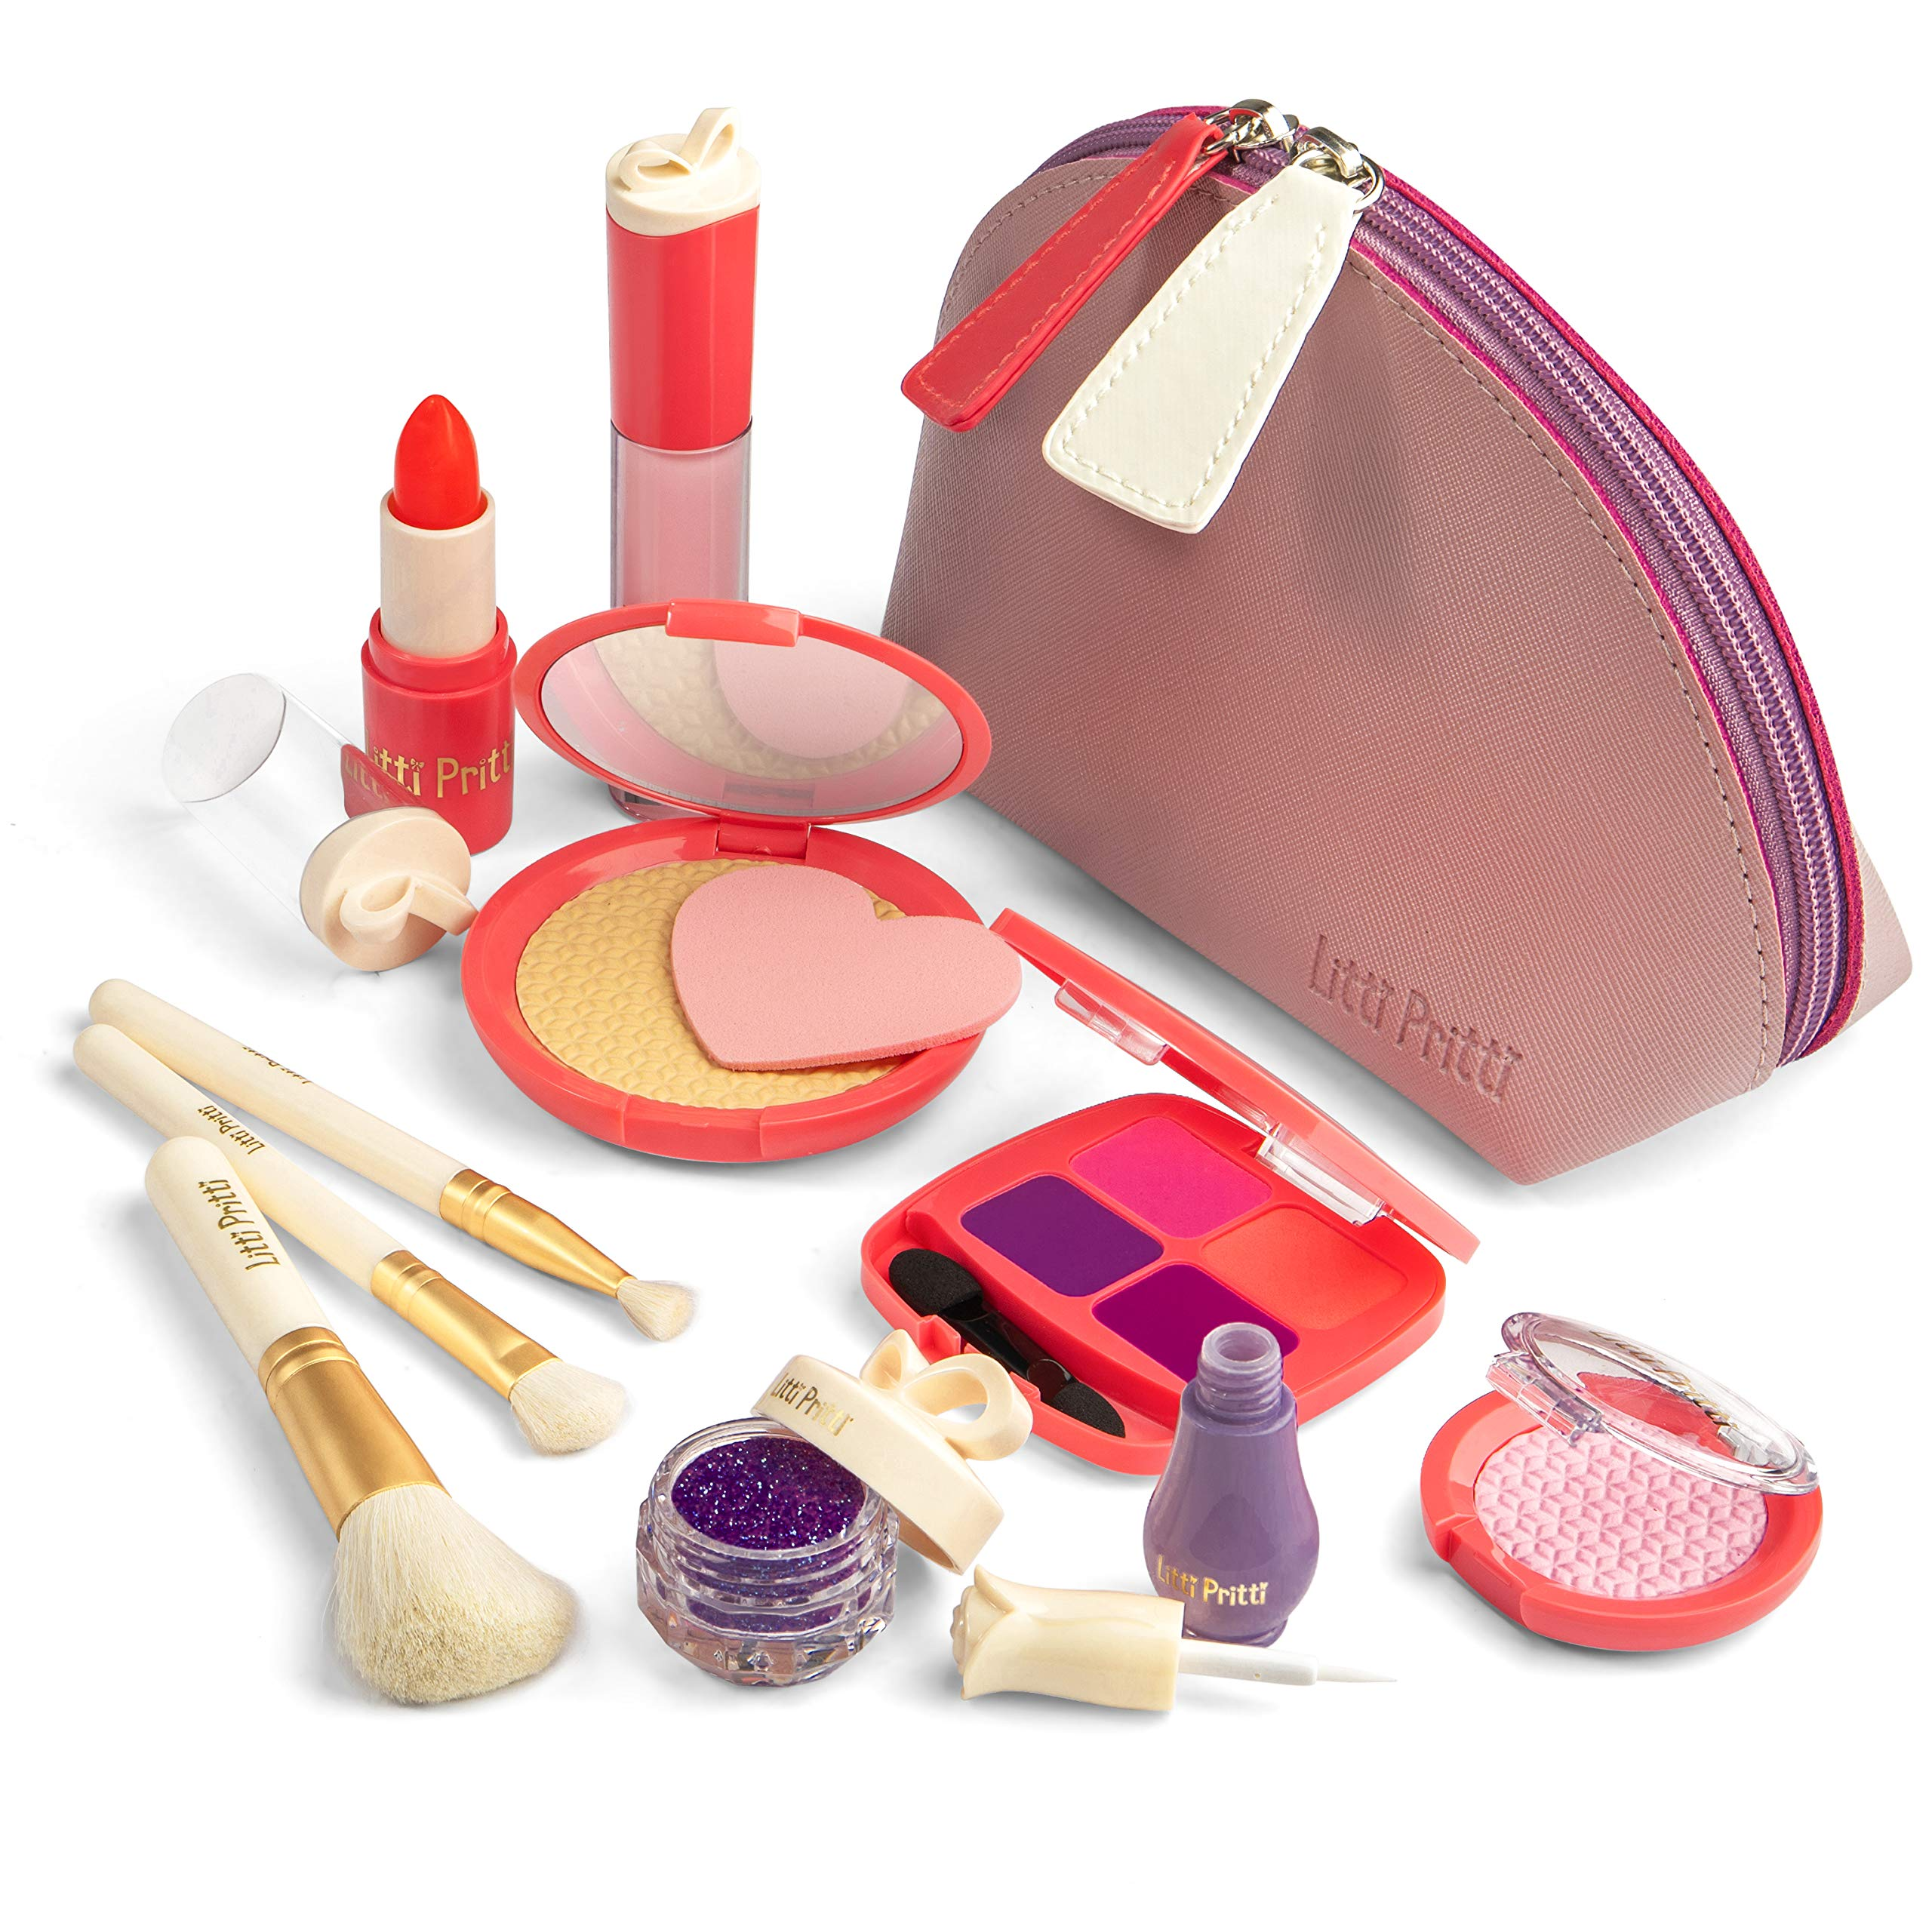 Litti Pritti Pretend Makeup for Girls - 11 Piece Play Makeup Set- Realistic Toys Makeup Set for Girls by Litti Pritti